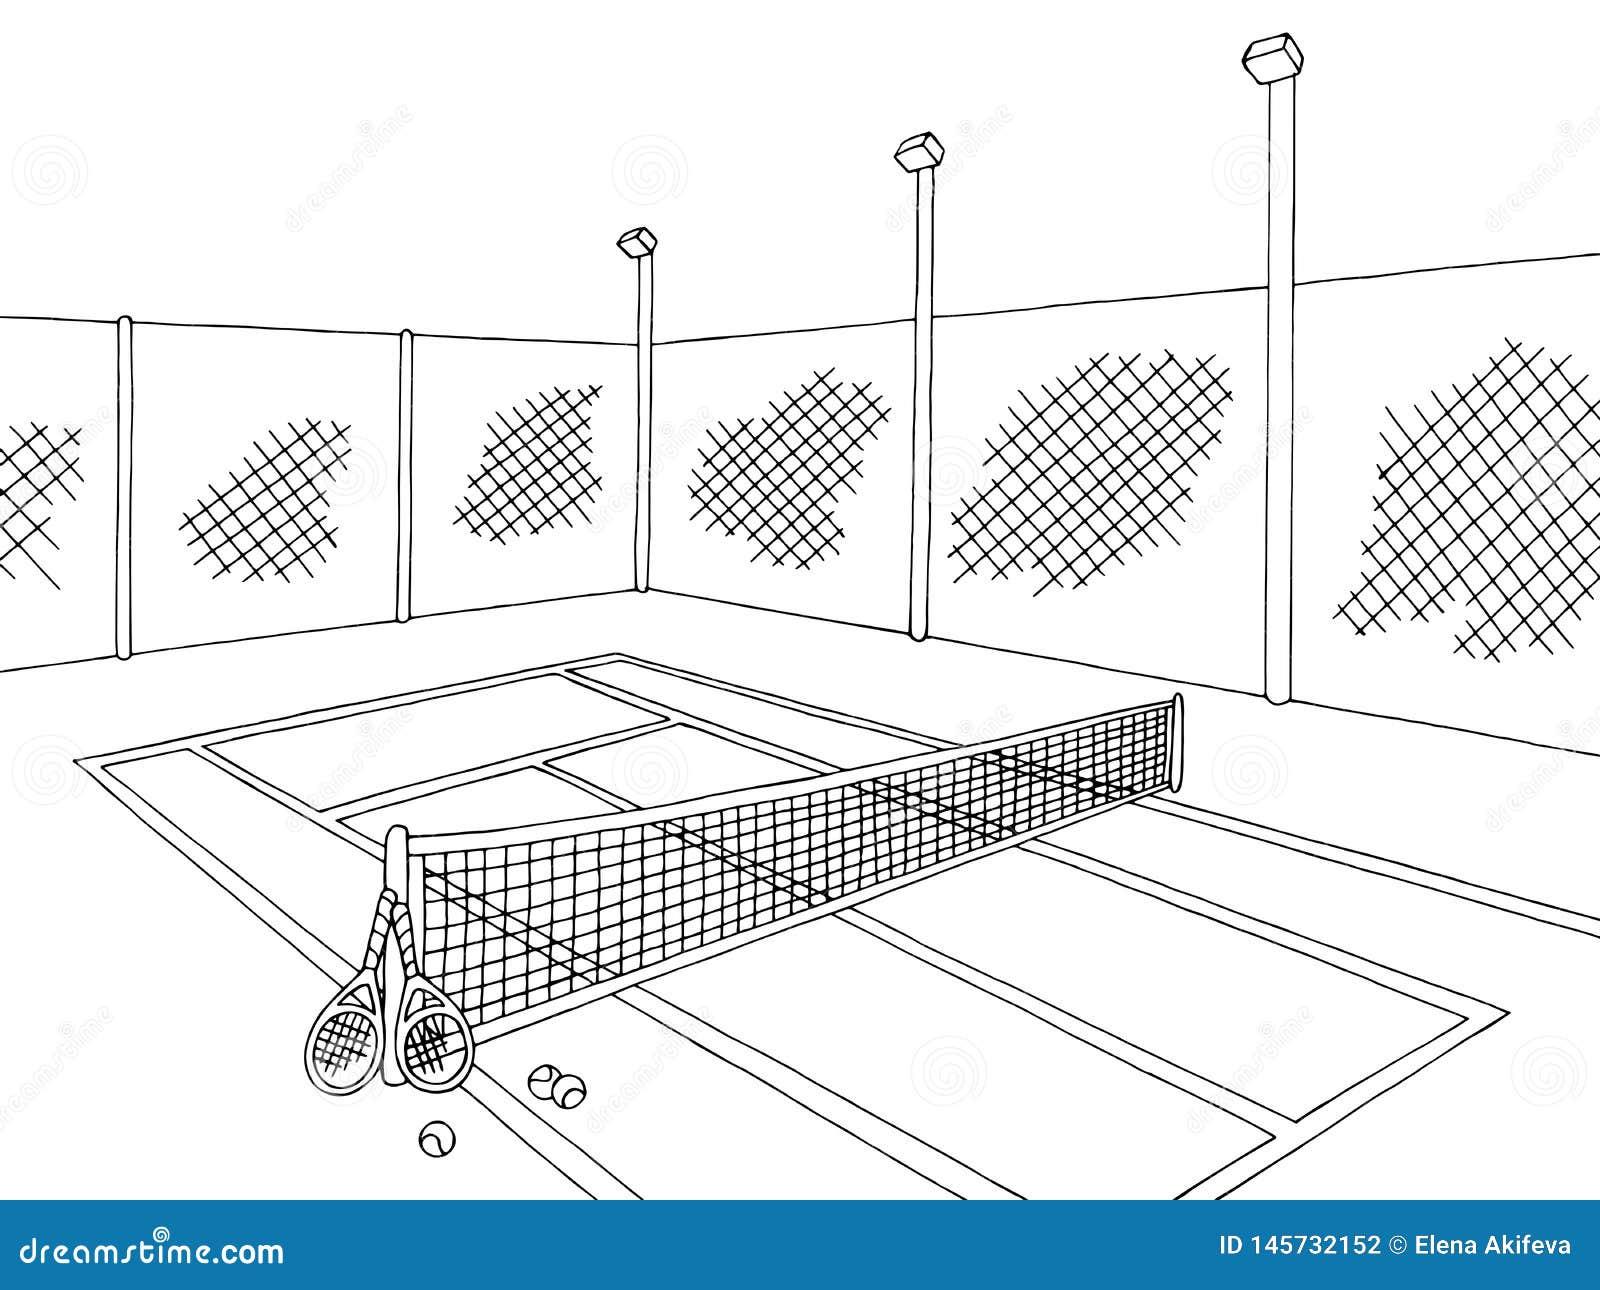 Tennis Sketch Stock Illustrations 2 828 Tennis Sketch Stock Illustrations Vectors Clipart Dreamstime